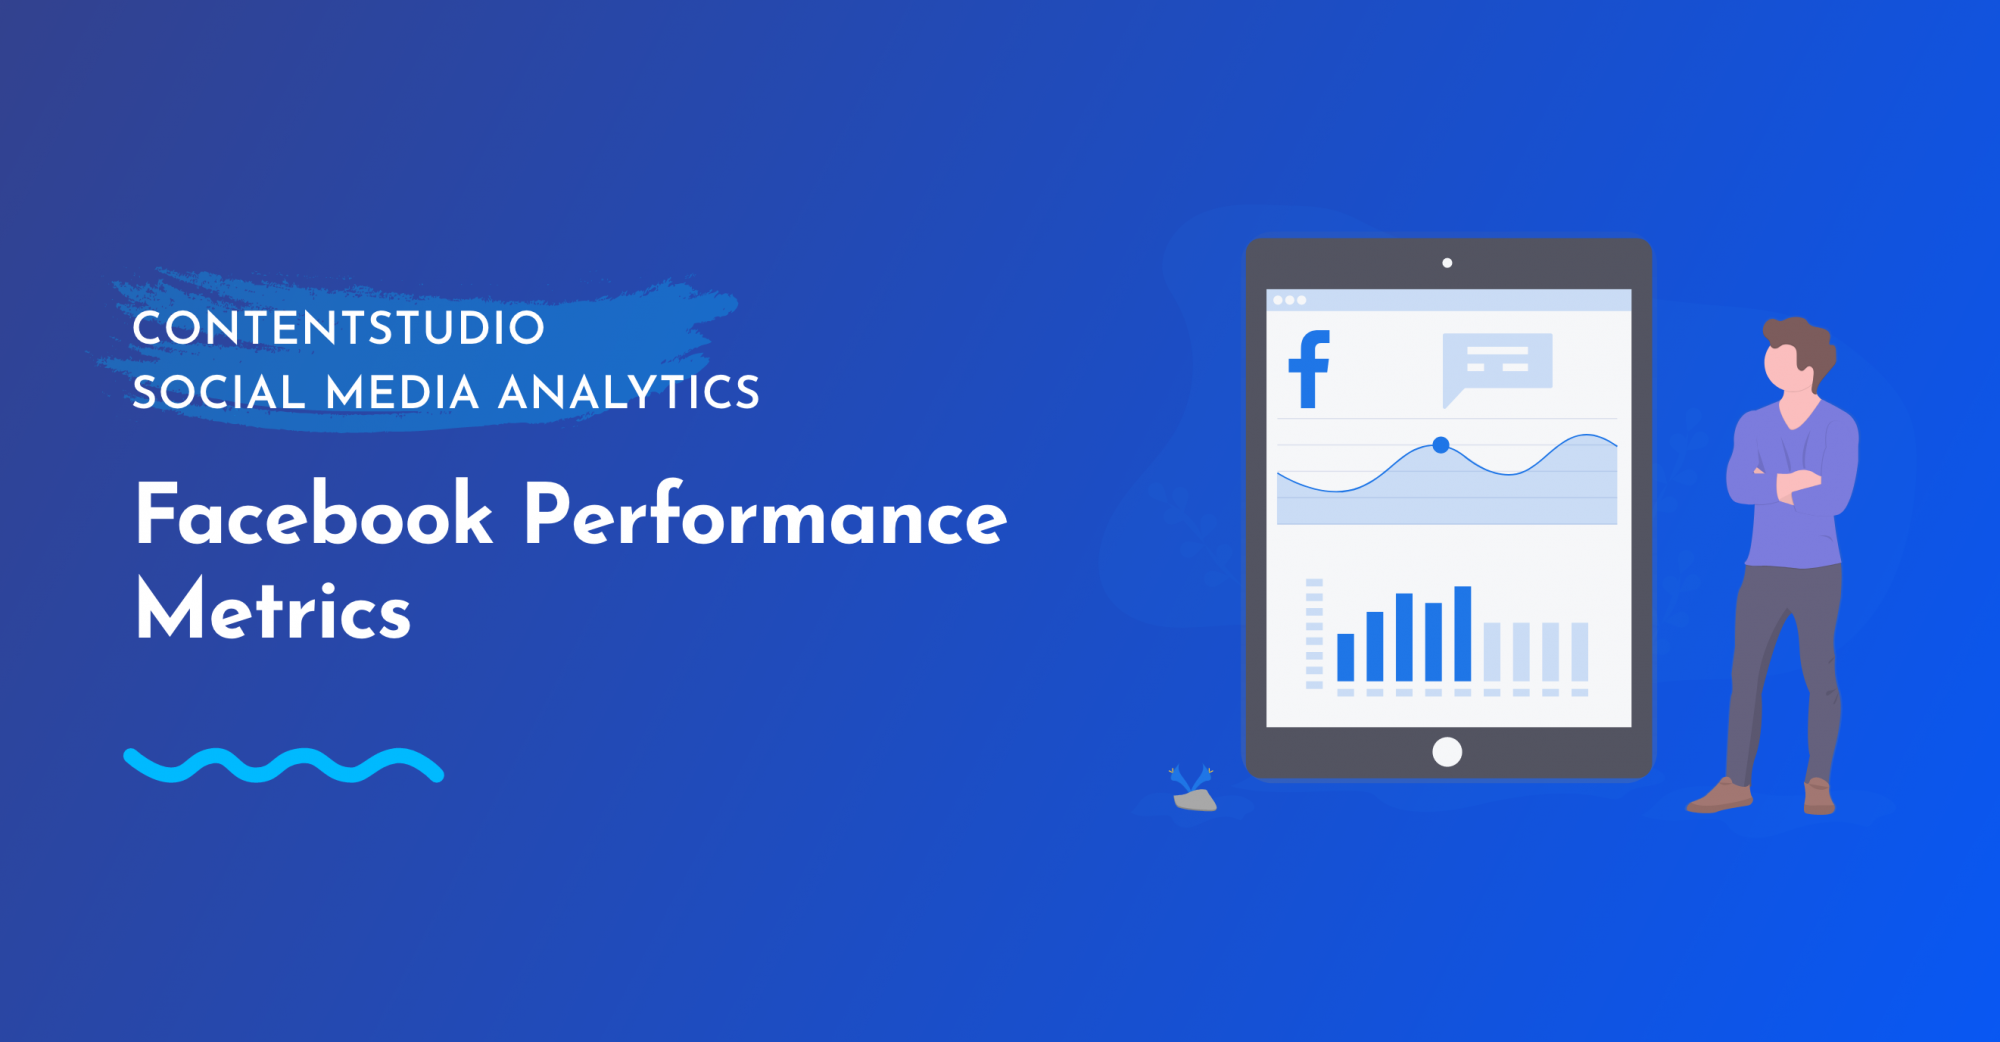 Facebook Performance Metrics - Social Media Analytics from ContentStudio